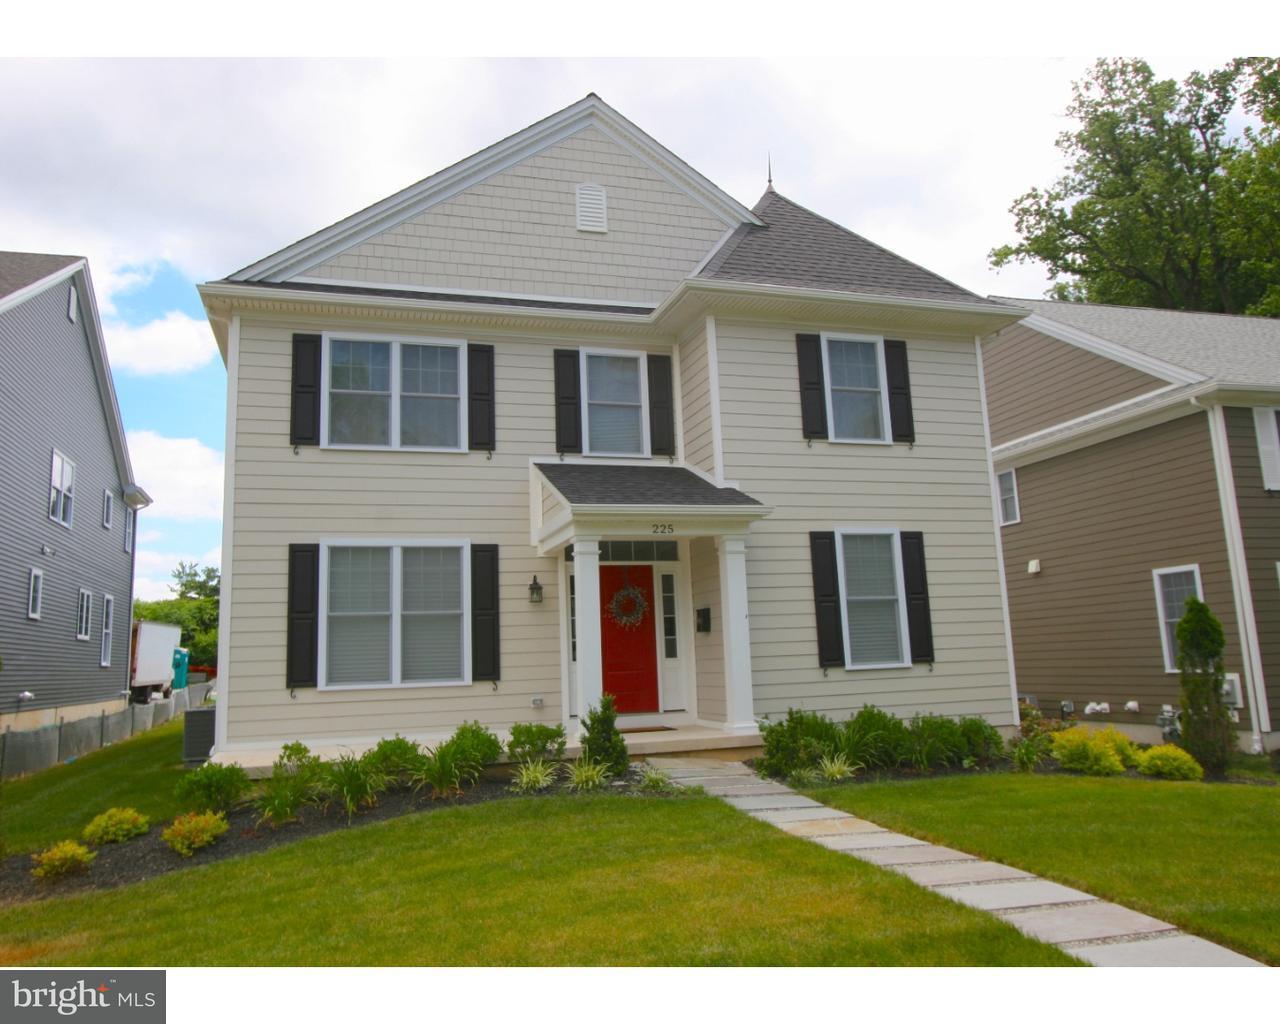 Single Family Home for Rent at 225 S WARREN Avenue Malvern, Pennsylvania 19355 United States